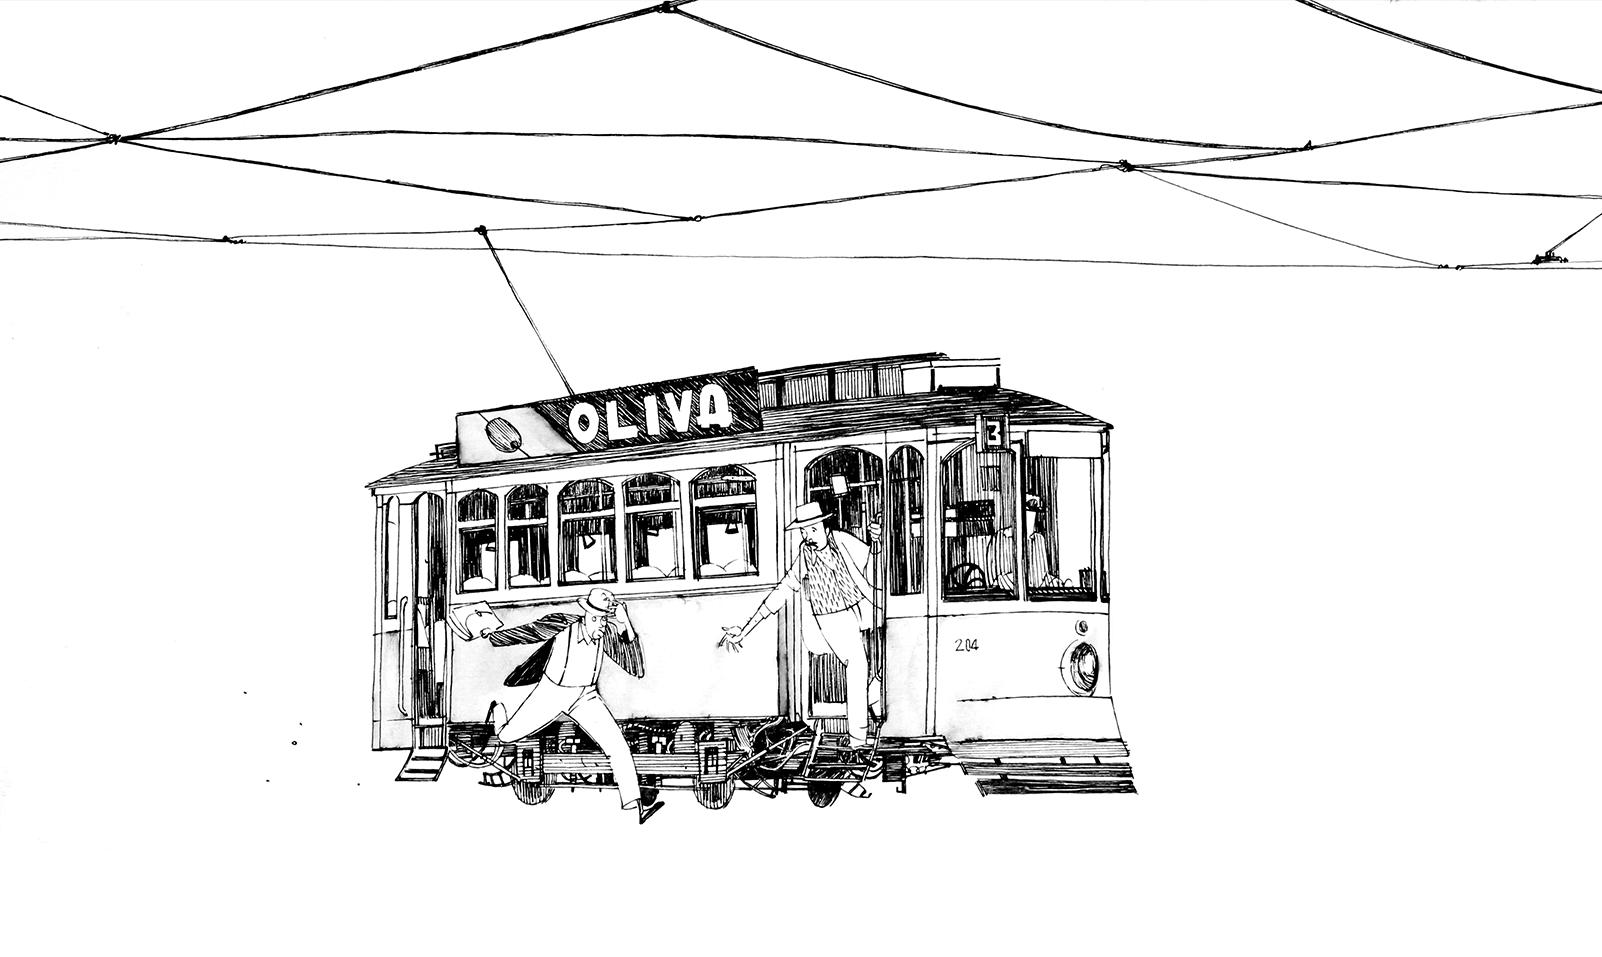 Matteo Berton / lisbon tram | Illustration / Line Drawings ...